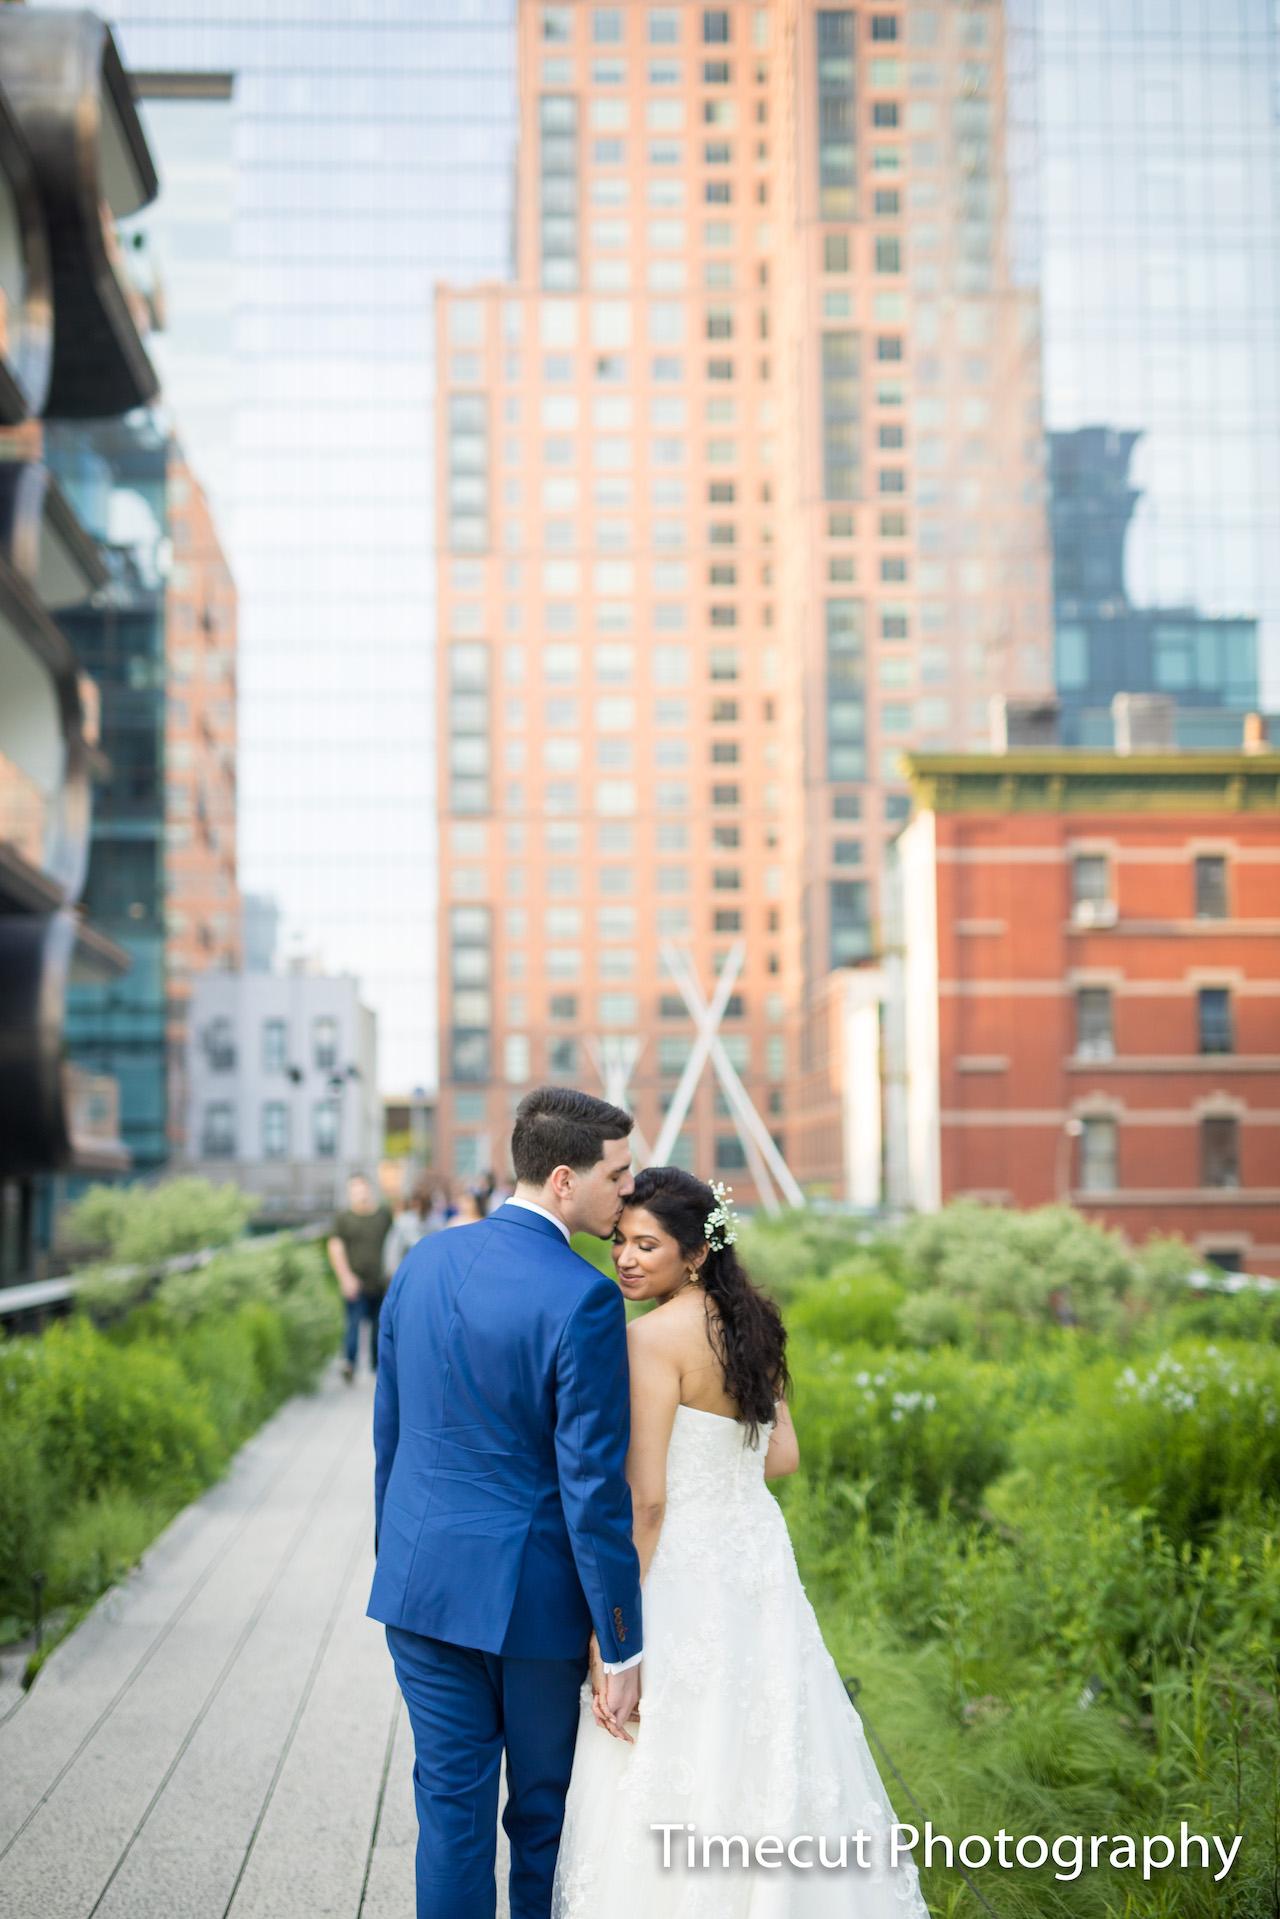 intimate-fun-bottino-wedding-Timecut Photography-AM-09.jpg